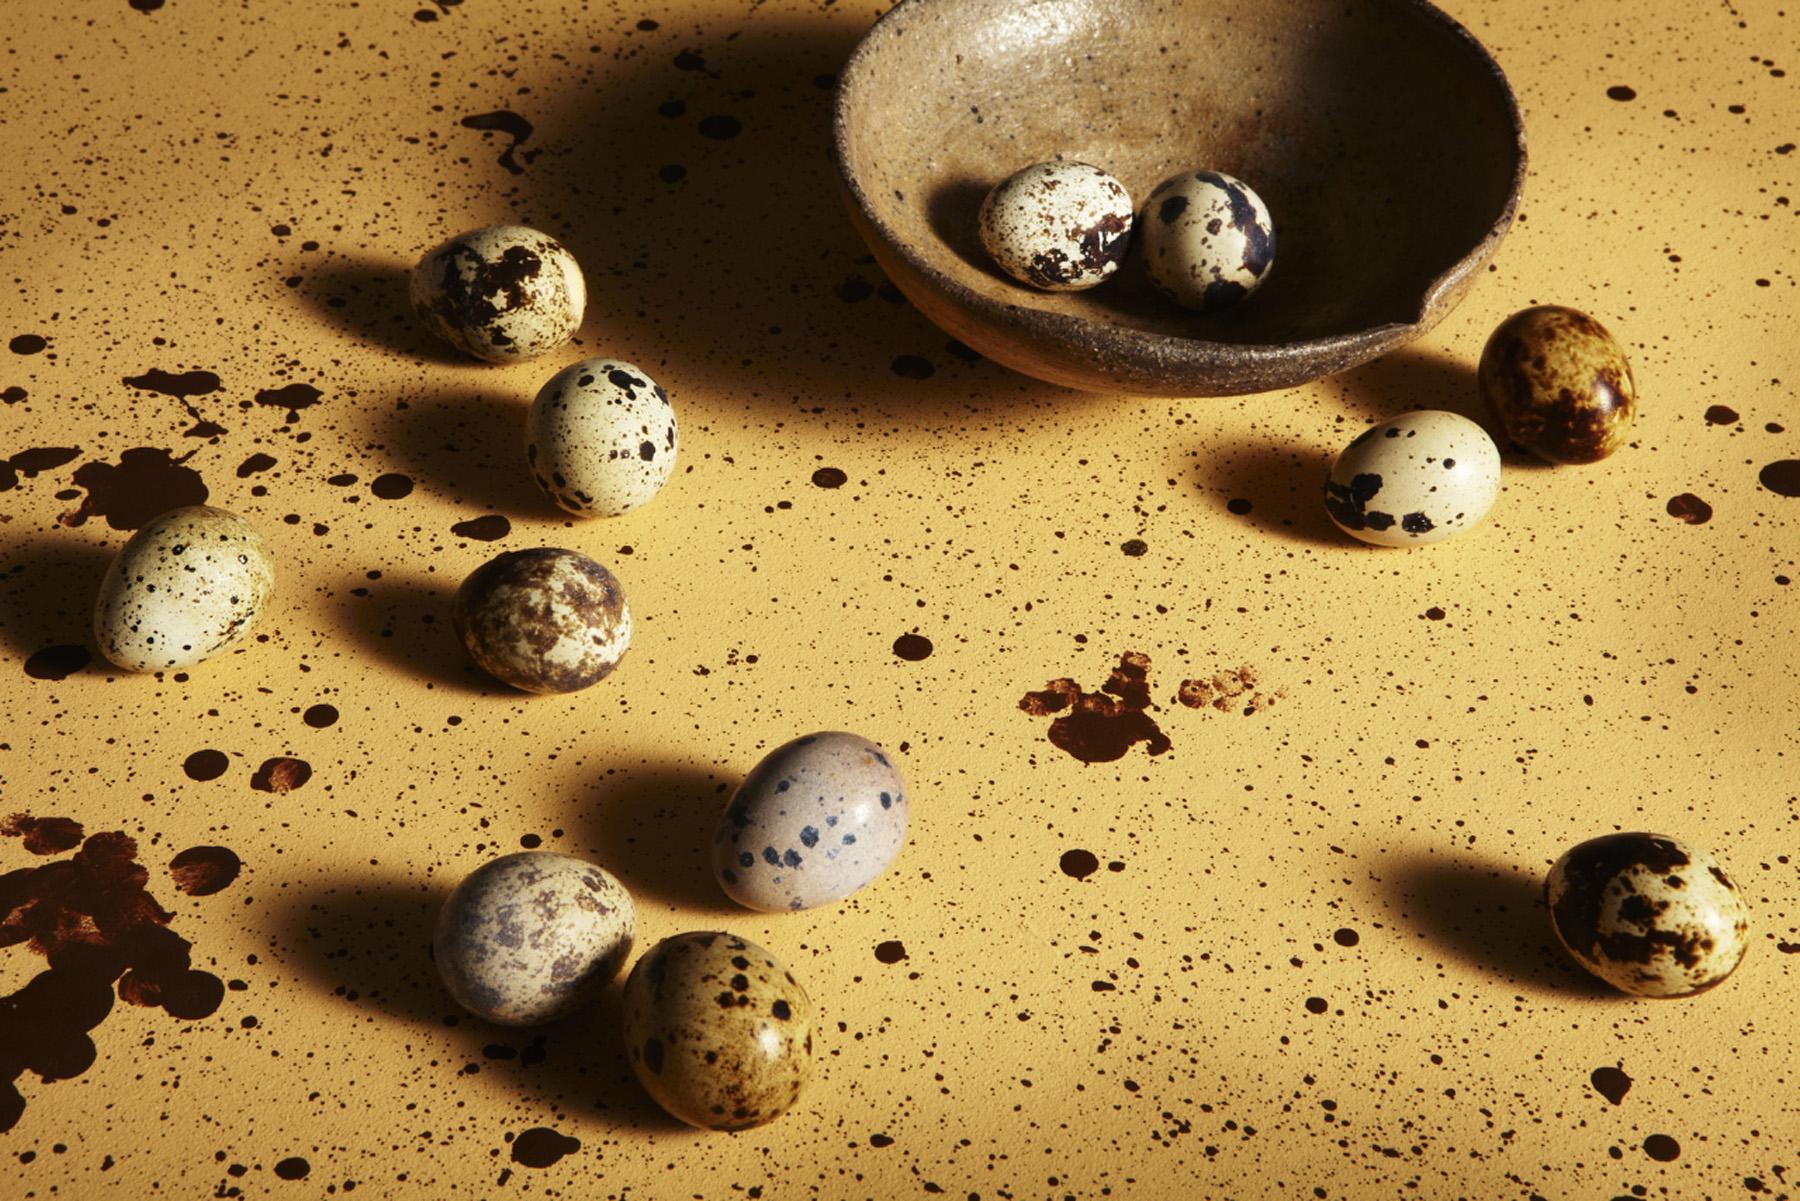 16-icon-artist-management-katie-hammond-food-icon-artist-management-katie-hammond-food-cream_exploration_of_eggs_ret_web.jpg